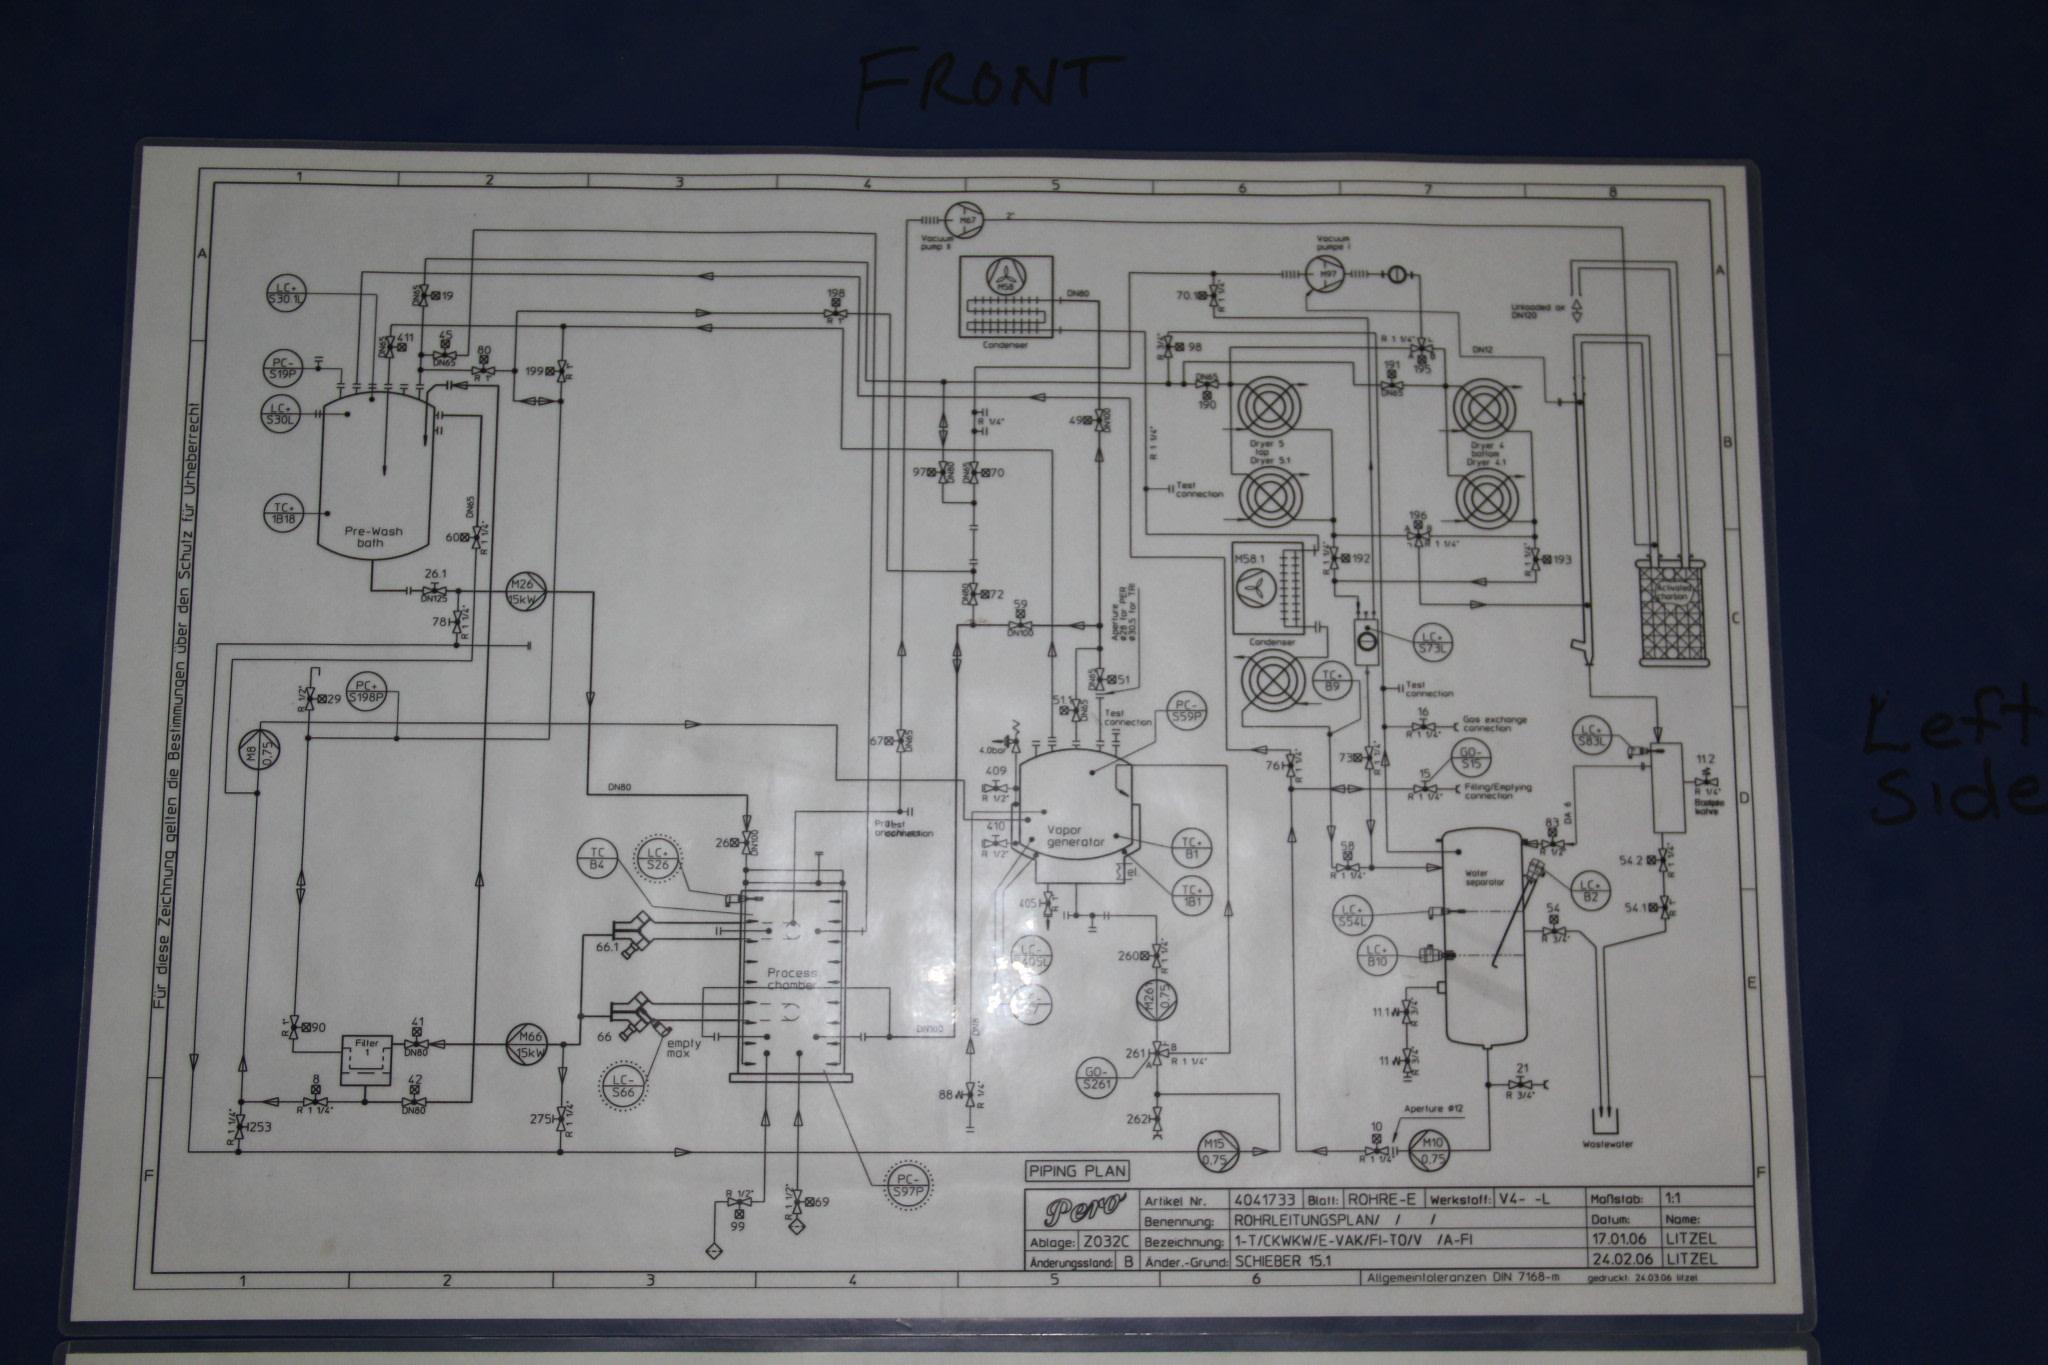 Rheem Heat Pump Thermostat Wiring Diagram pioneer avhp4000dvd – Kenmore Heat Pump Thermostat Wiring Diagrams